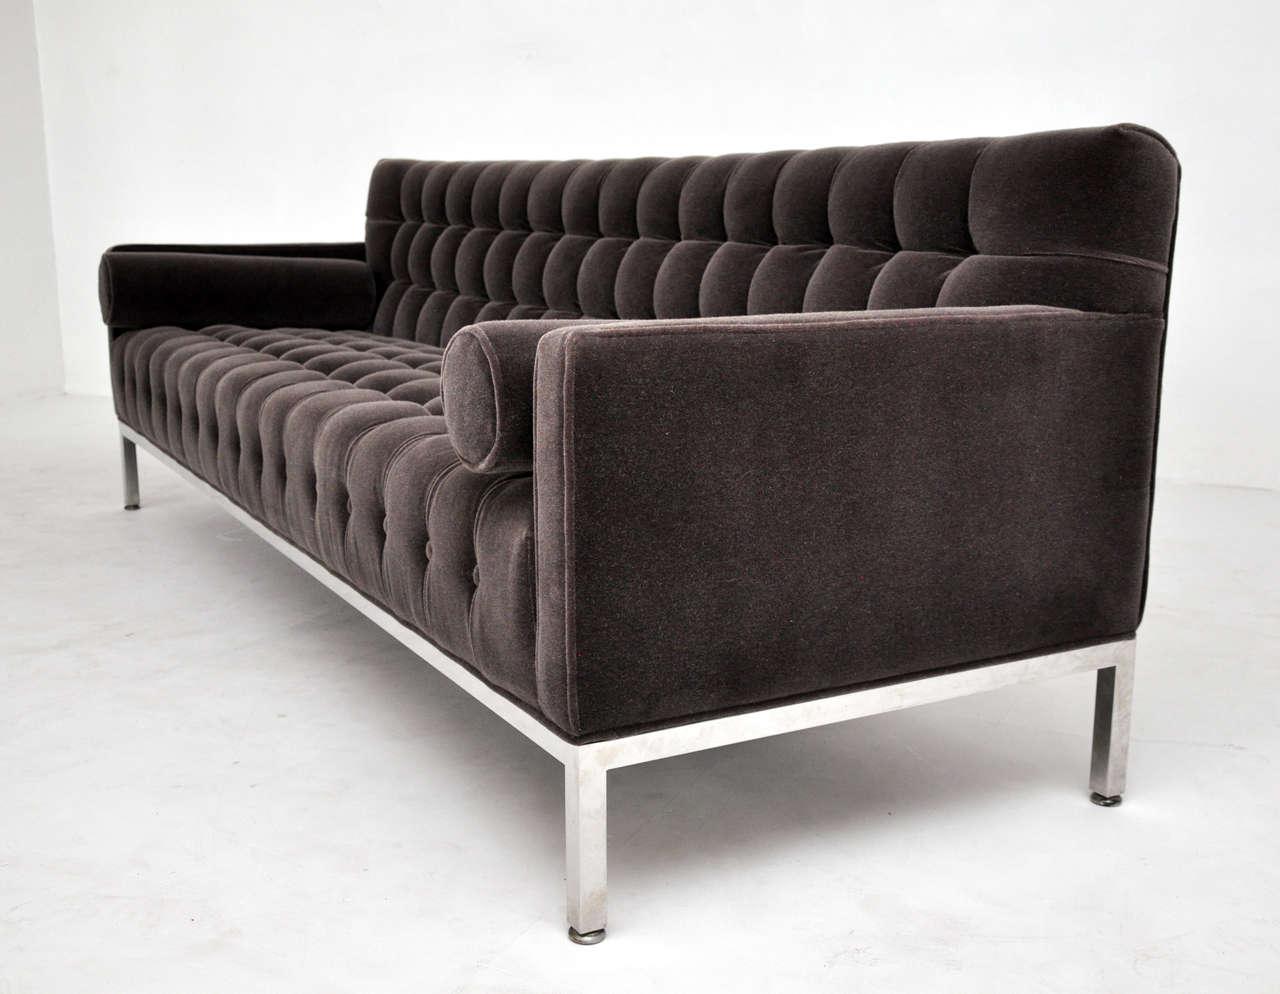 Tufted baker sofa image 7 for Baker furniture sectional sofa